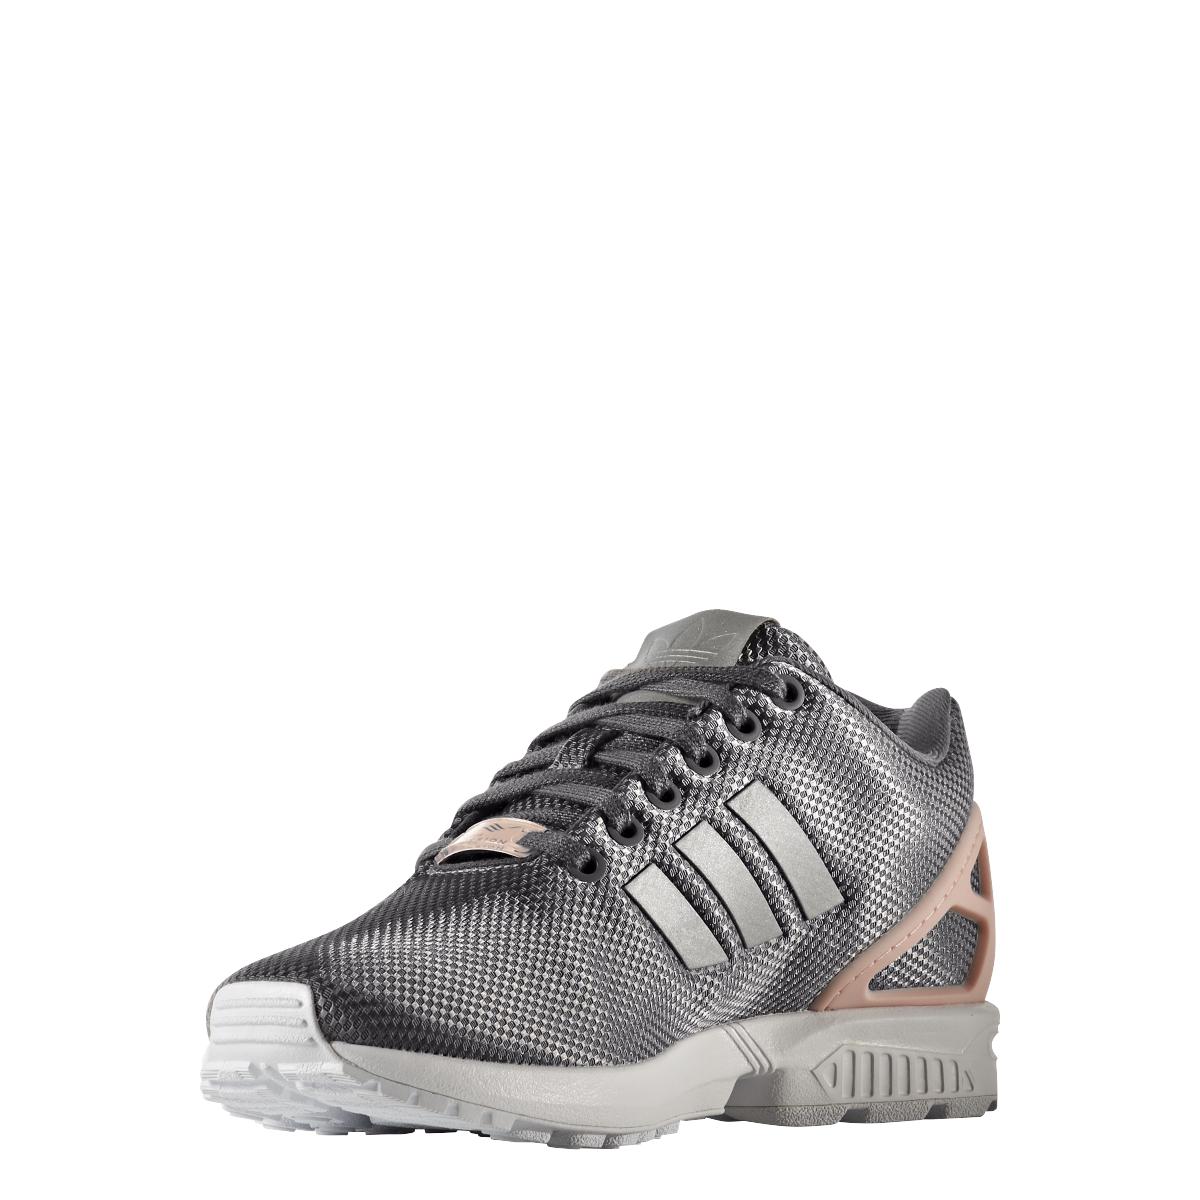 sport klingenmaier adidas originals zx flux sneaker. Black Bedroom Furniture Sets. Home Design Ideas